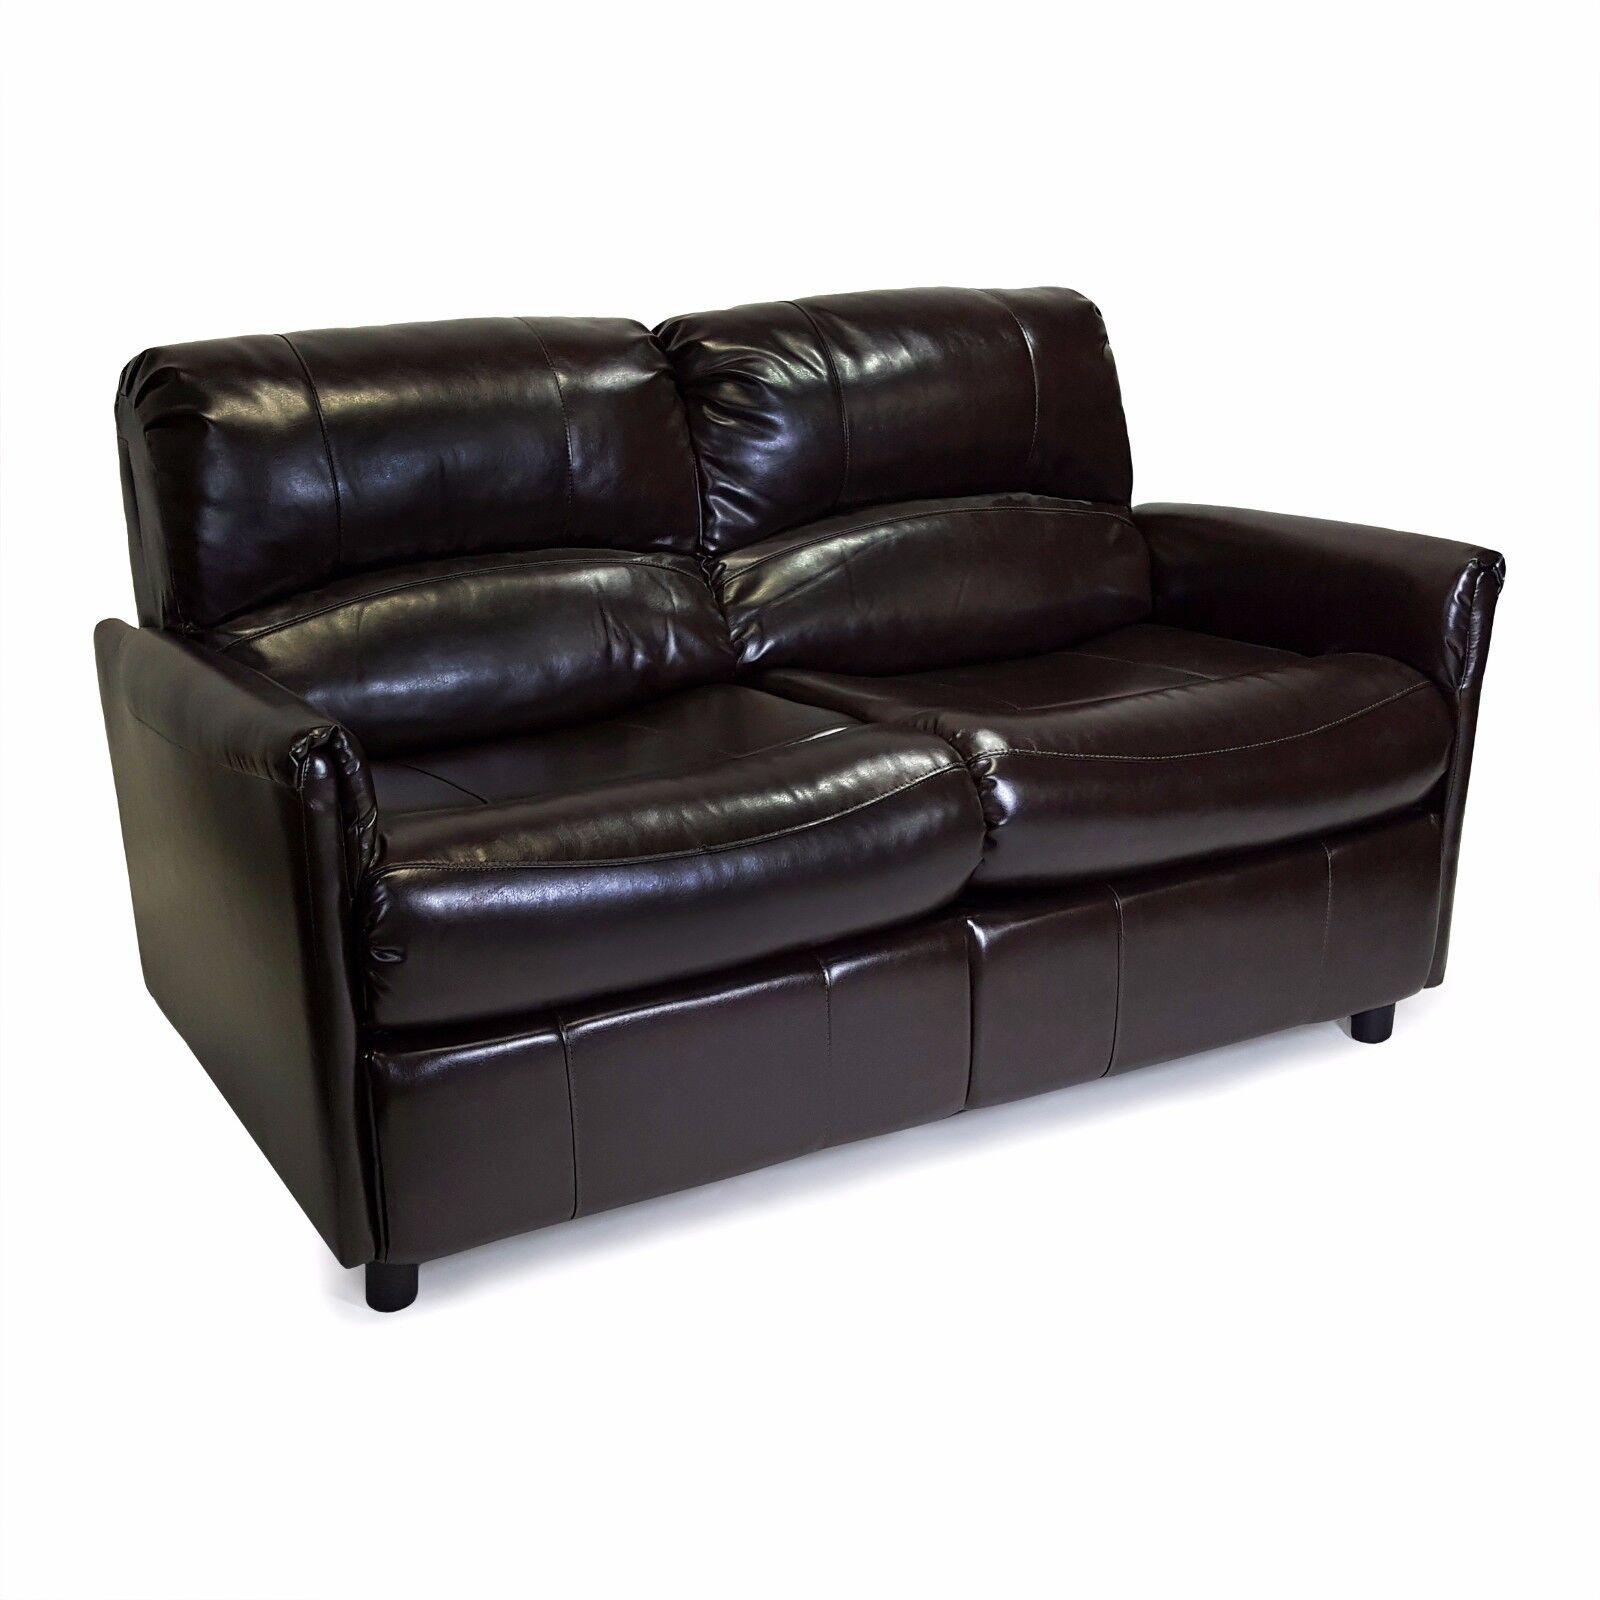 "RecPro Charles 60"" RV Sofa Sleeper w/Hide A Bed Loveseat Esp"